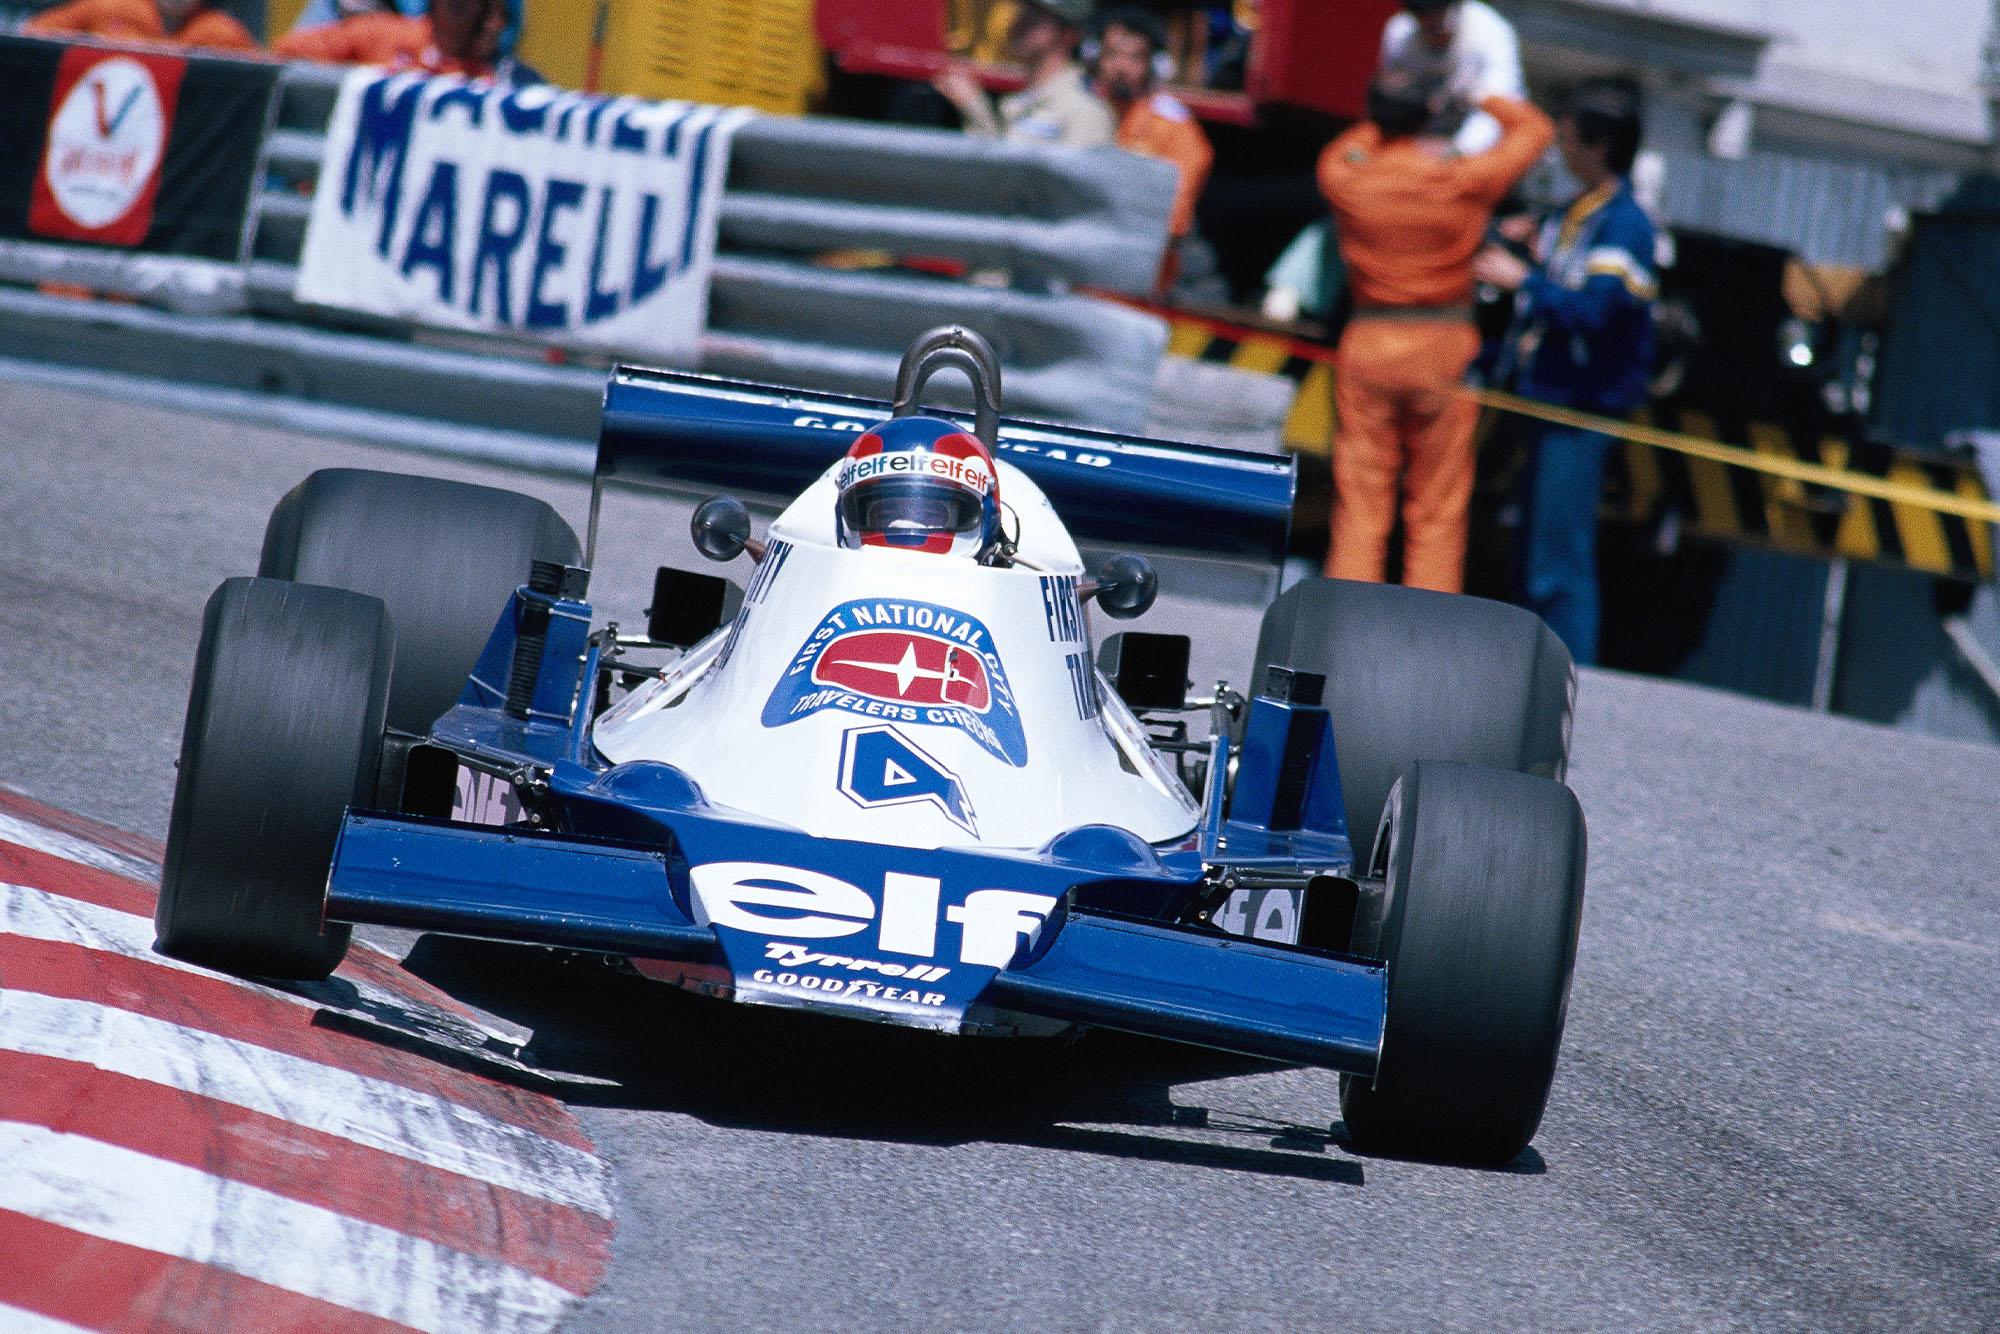 Patrick Depailler (Tyrrell) driving at the 1978 Monaco Grand Prix.